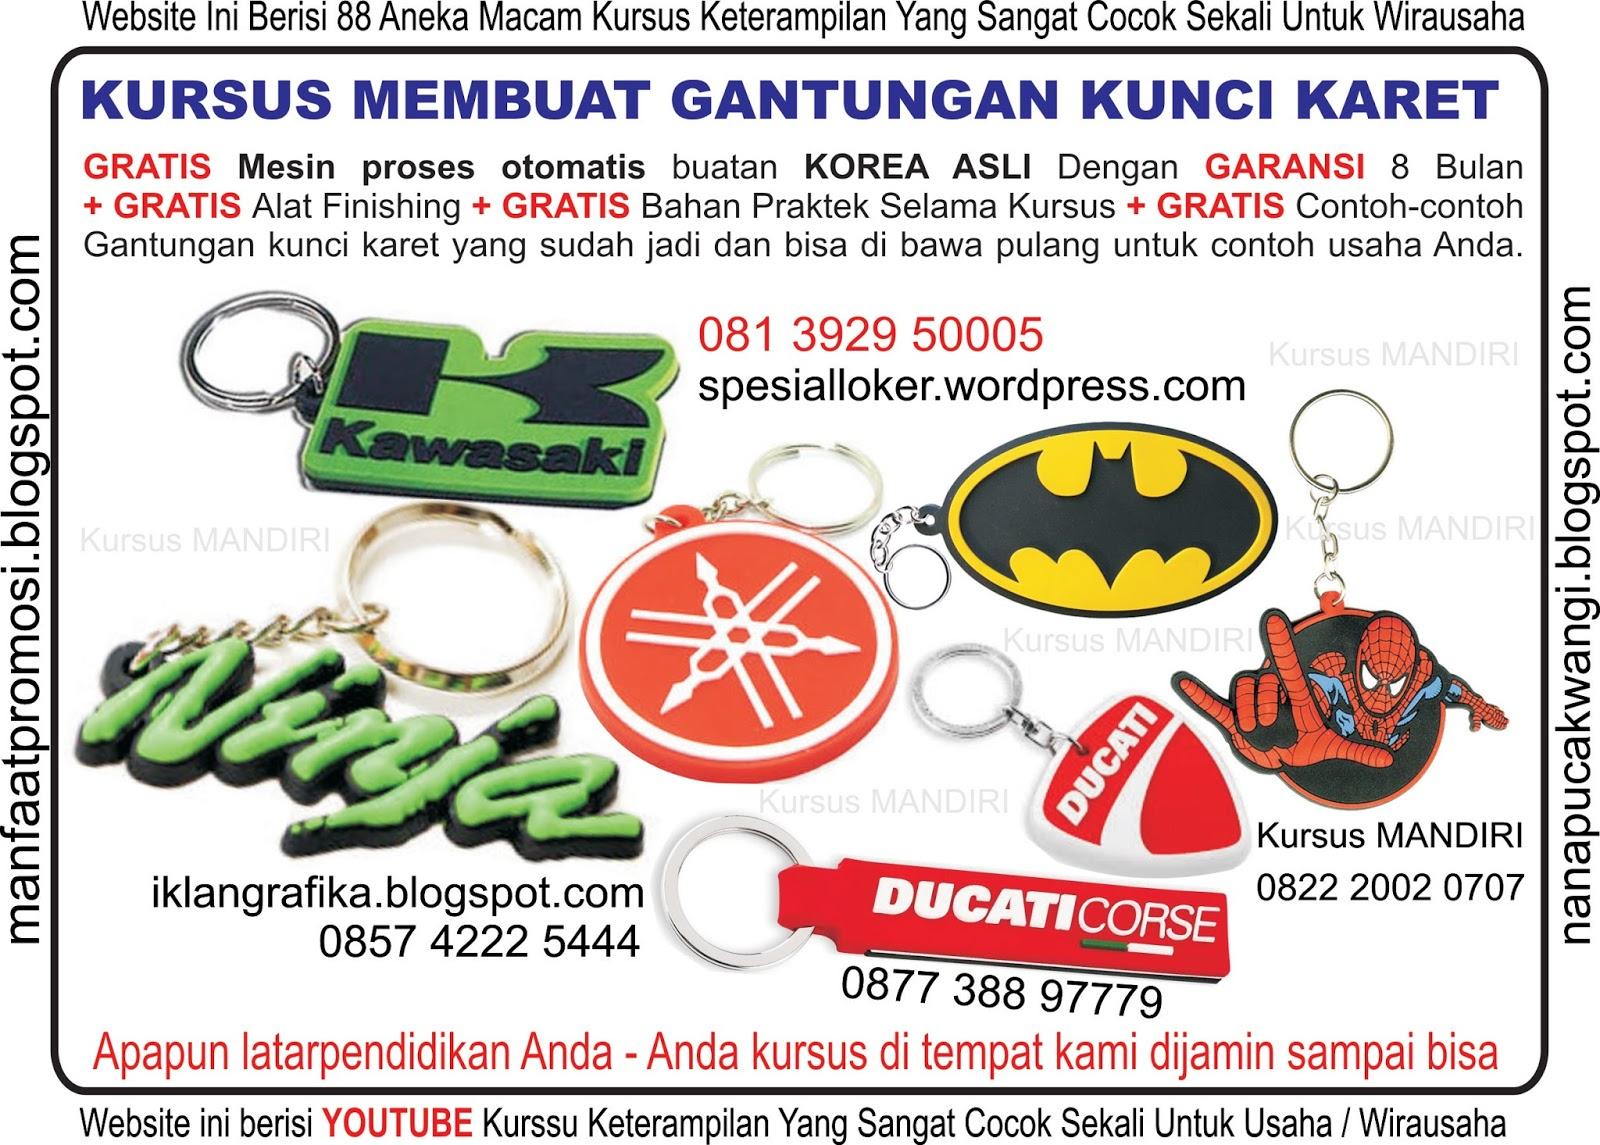 Karyawan Freeport Timika Freeport Jakarta Buruh Polisi